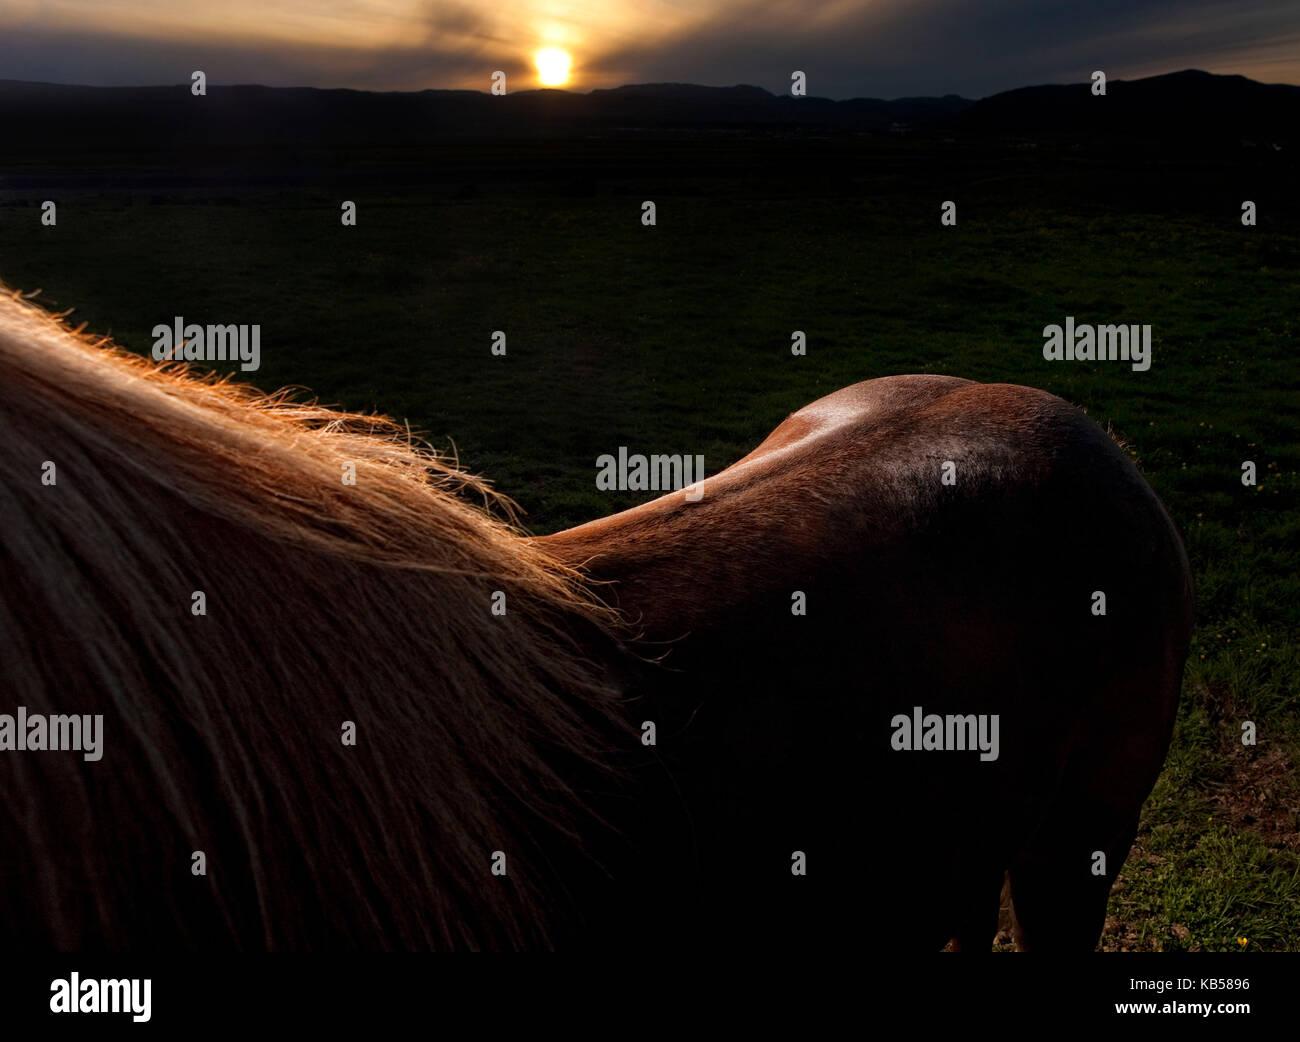 Rim light on brown Icelandic Horse, Iceland - Stock Image